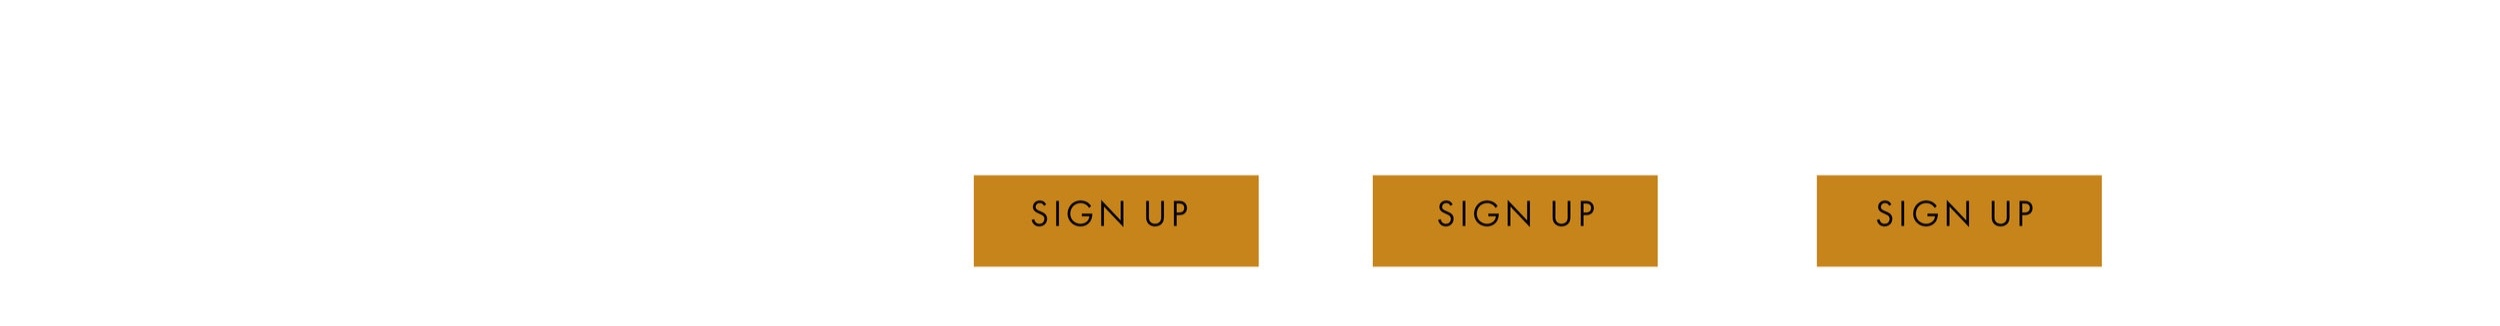 Full+Membership+Page.jpg